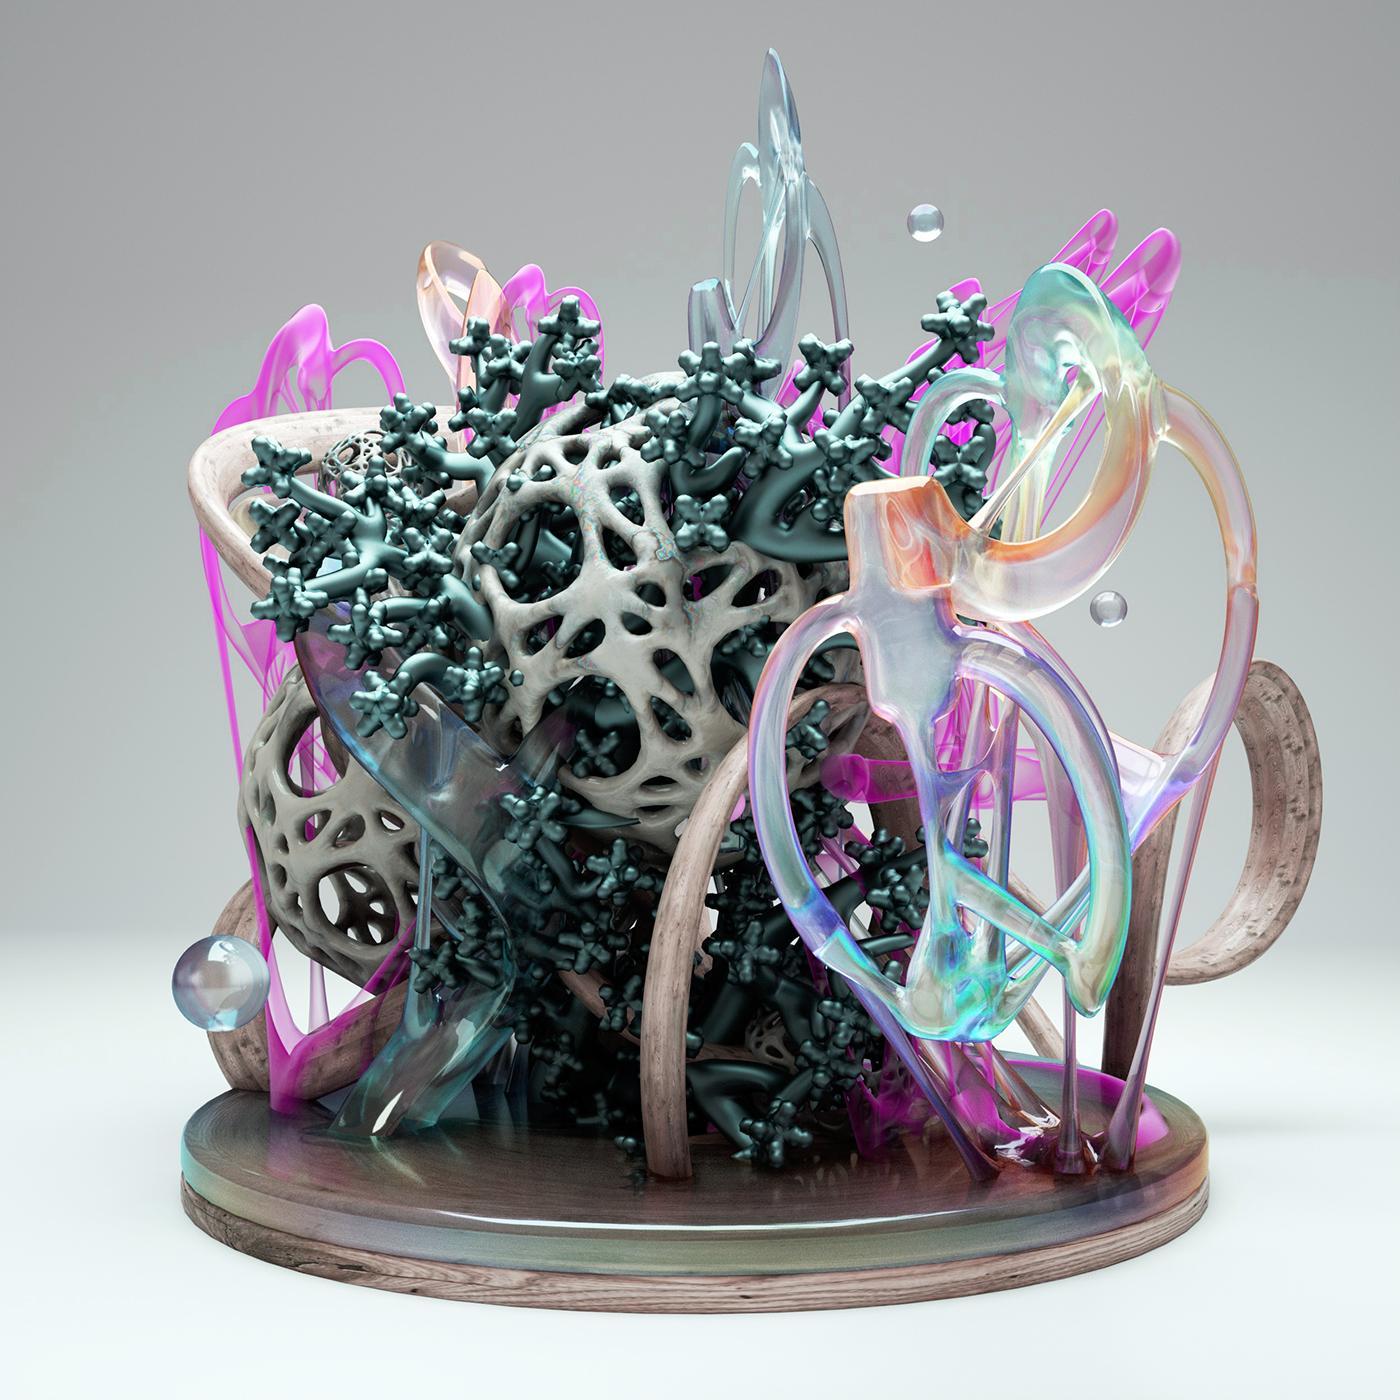 SURREAL WORLDS by Antoni Tudisco